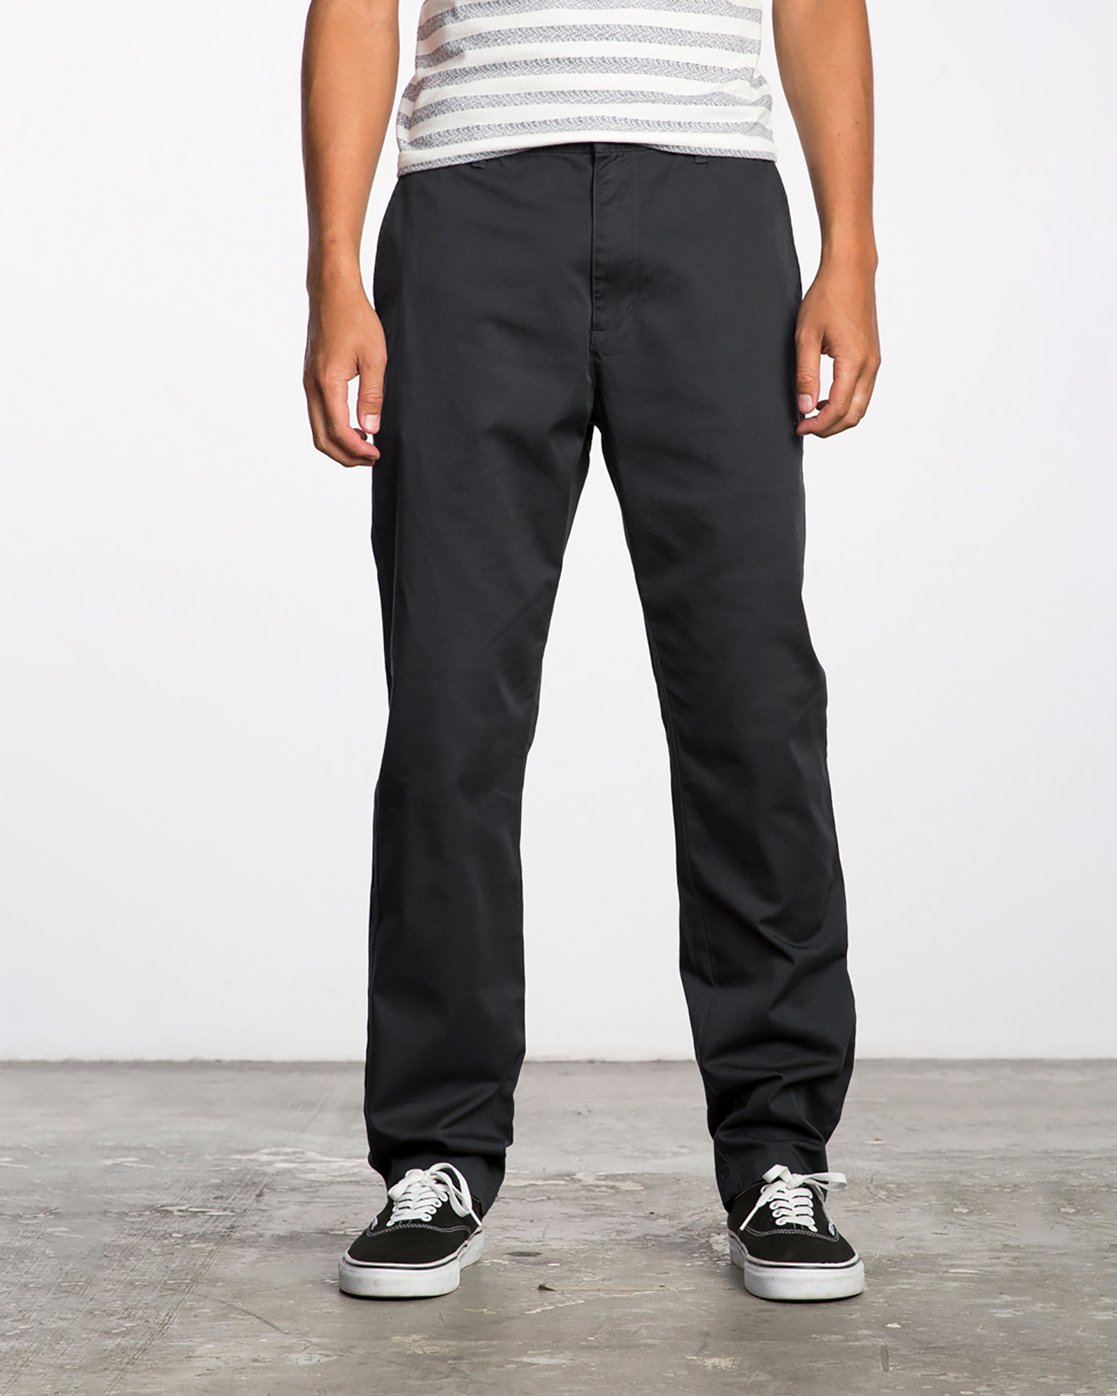 0 The Dayshift II Chino Pants Black MG302DAY RVCA